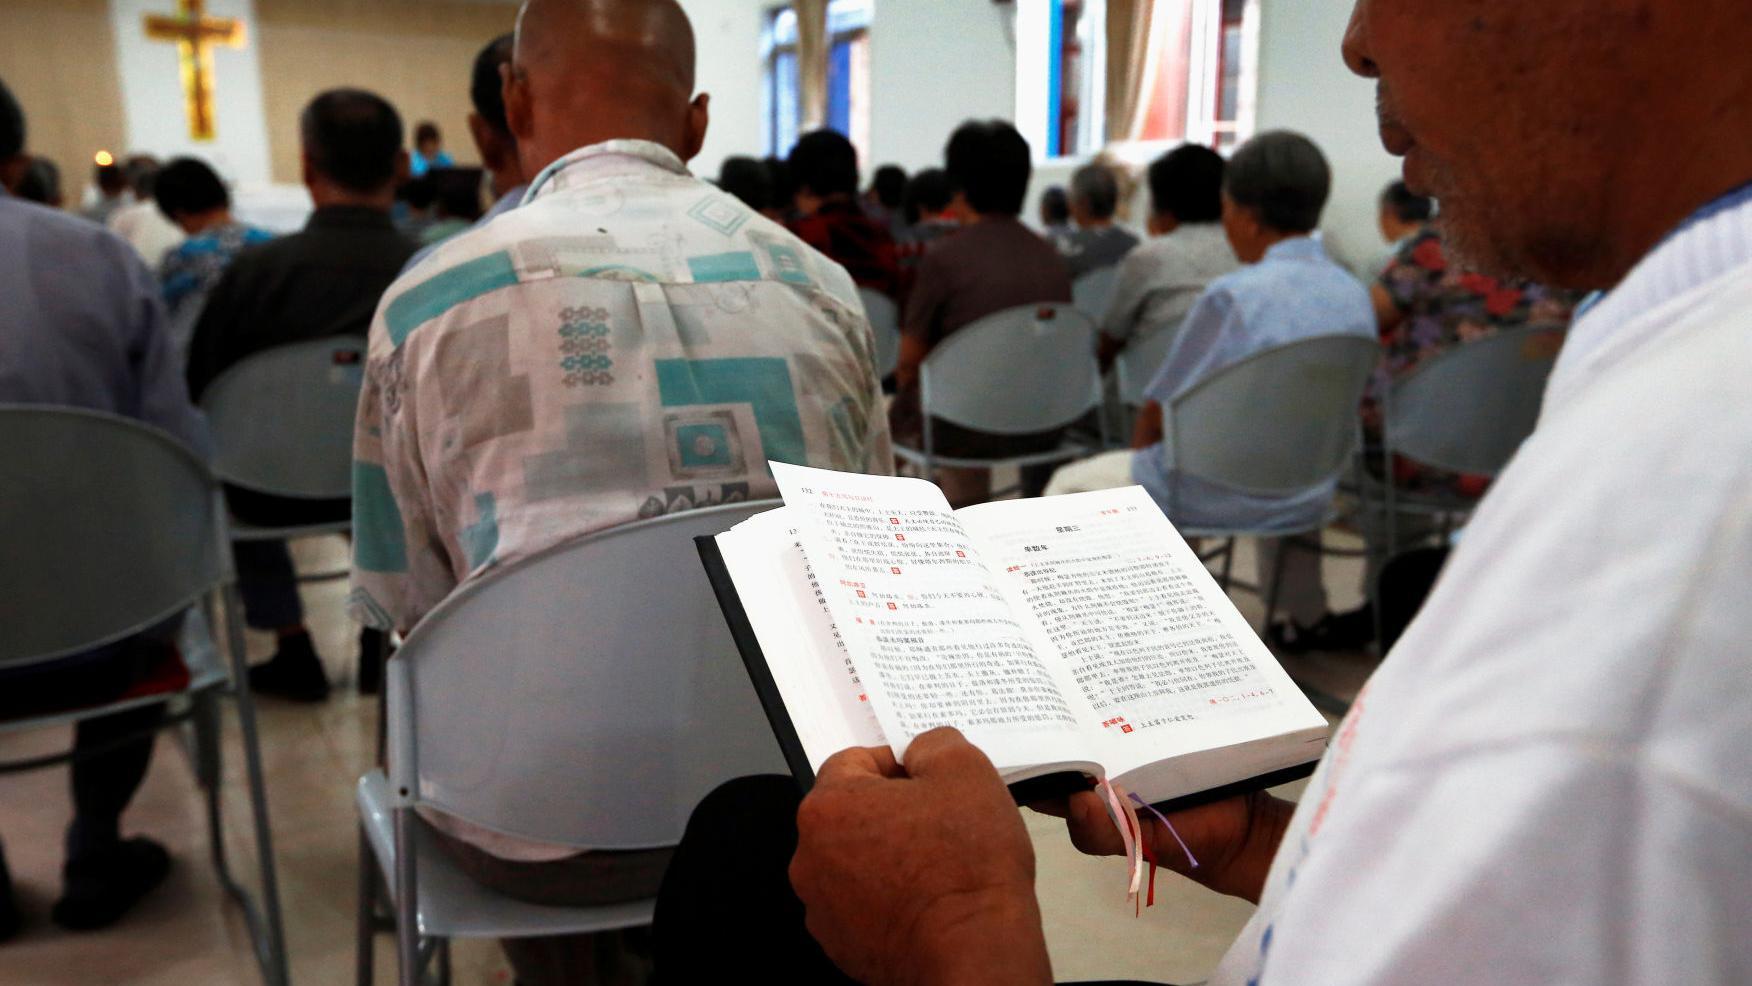 Nuns arrested as Beijing turns up heat on Roman Catholic Church in Hong Kong